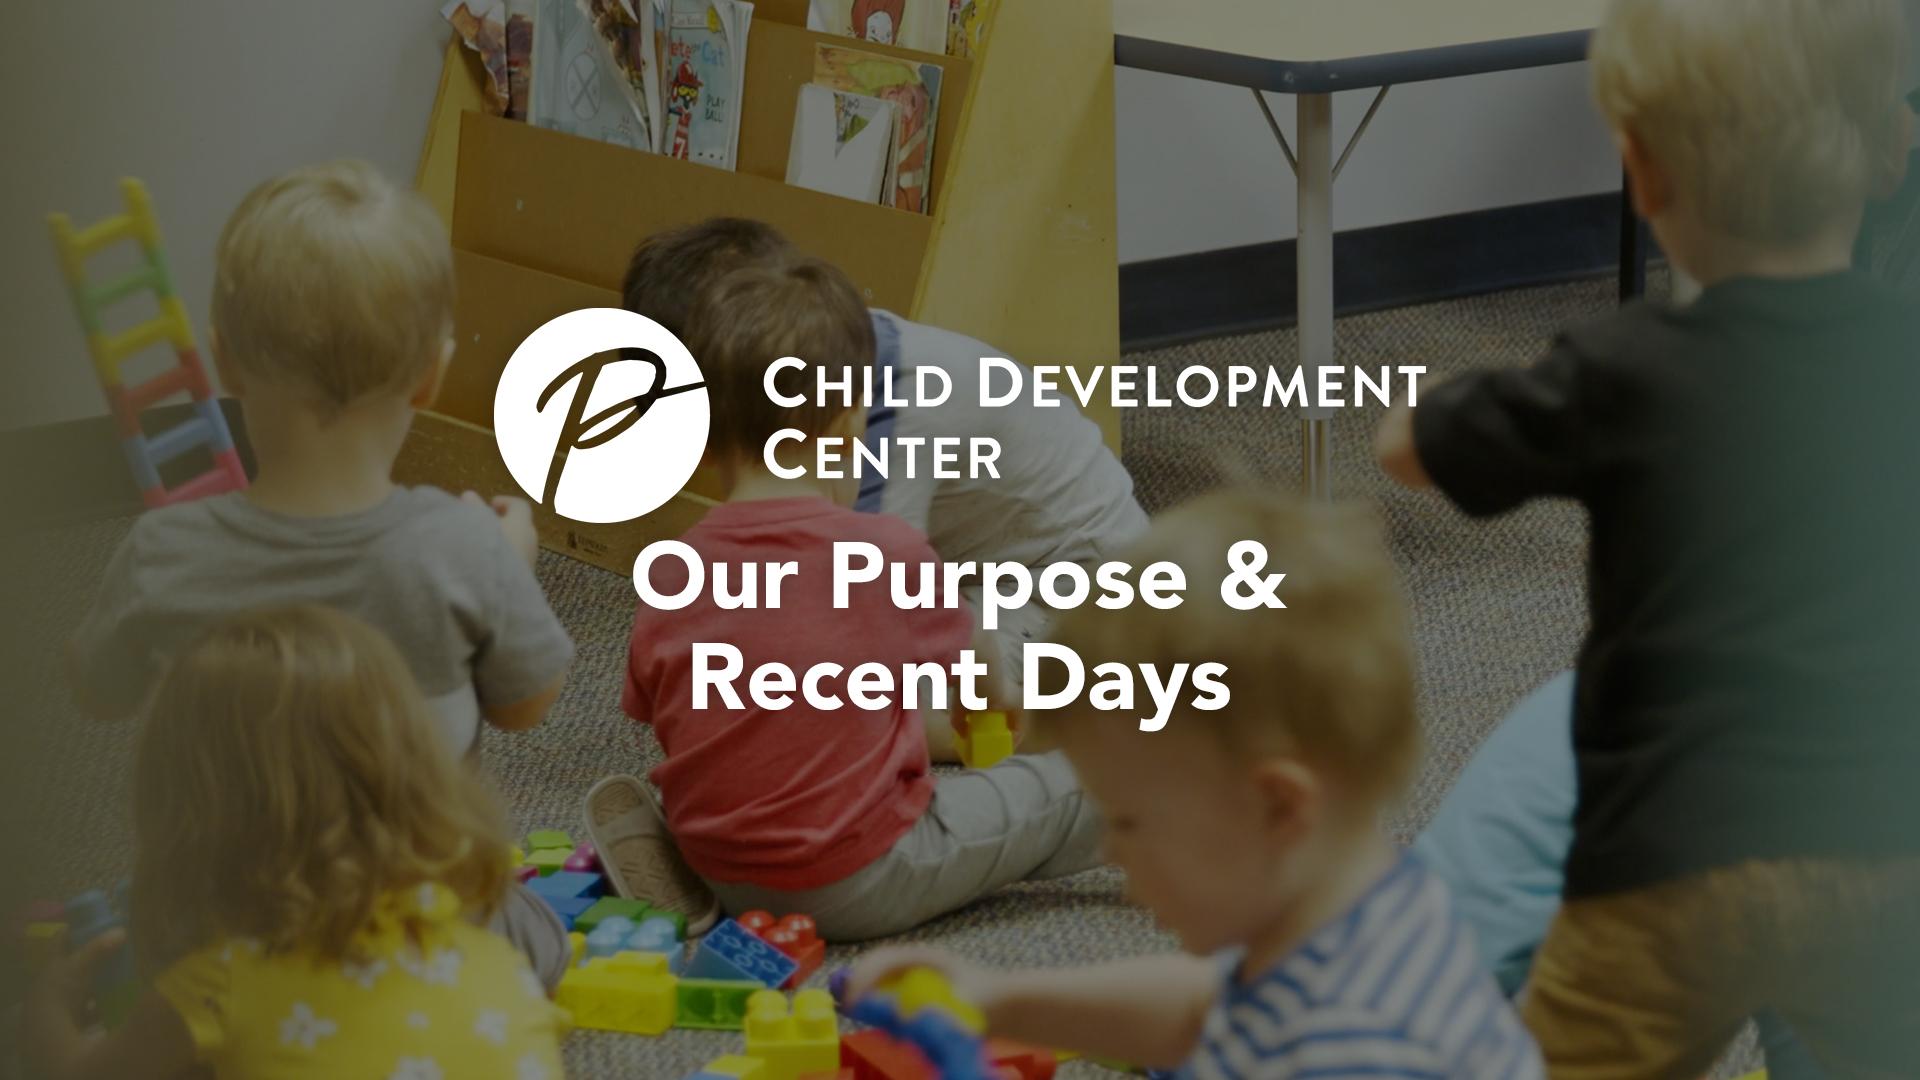 Video – Pioneer Drive Child Development Center Video